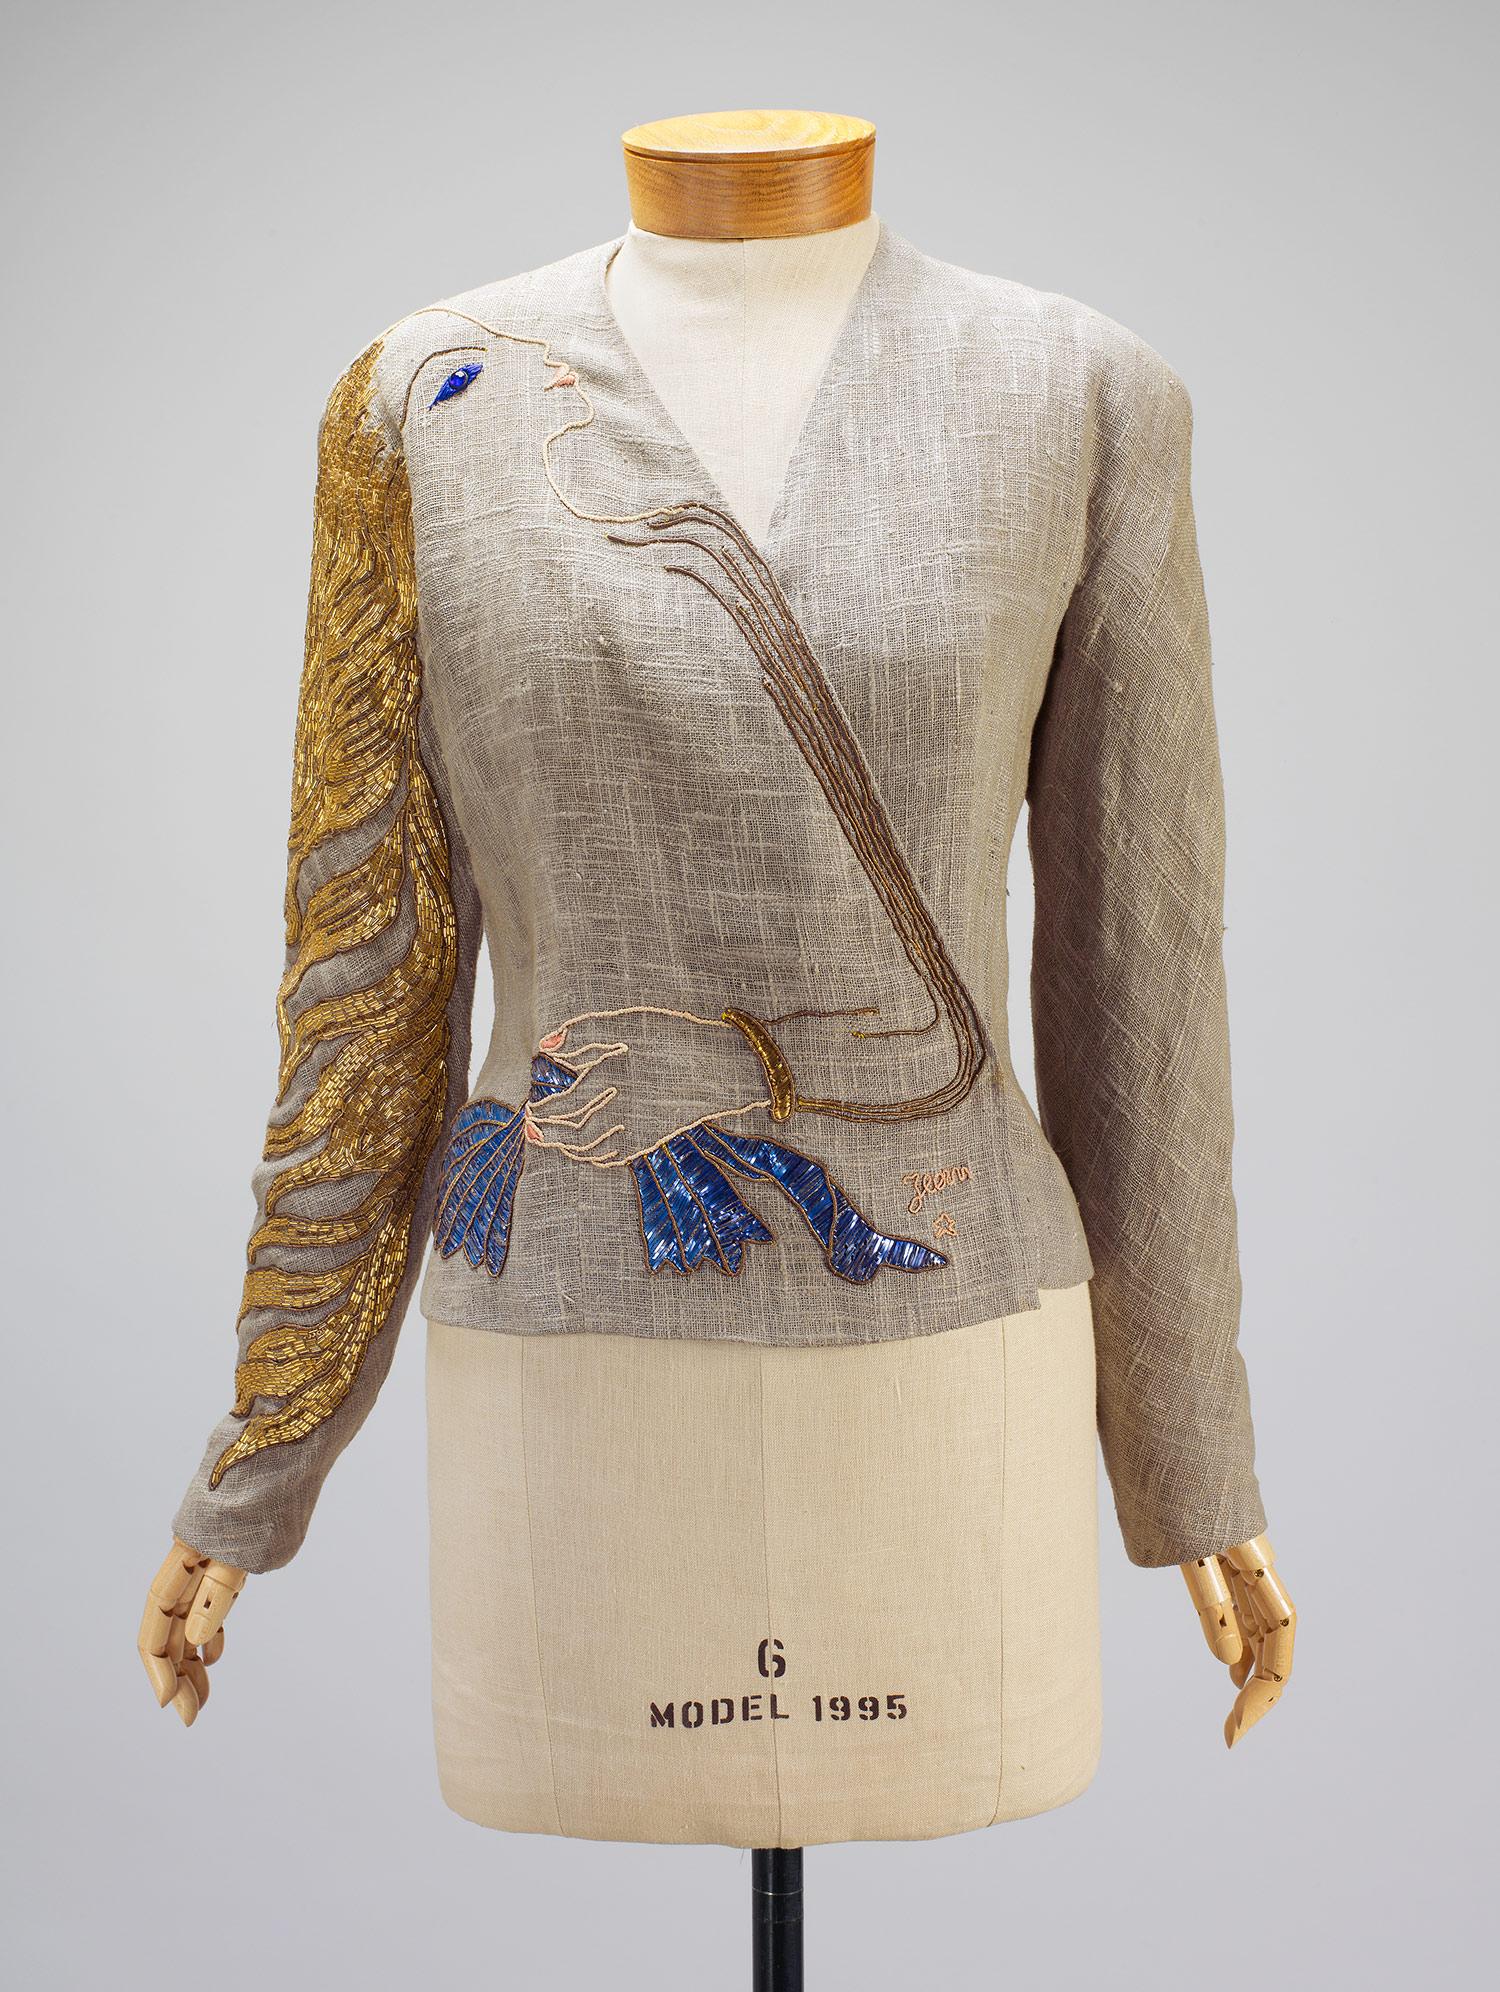 Cocteau Evening Jacket Fall 1937 Elsa Schiaparelli Italian 18901973 Linen  Metallic Foil Beads Paillettes   Designer